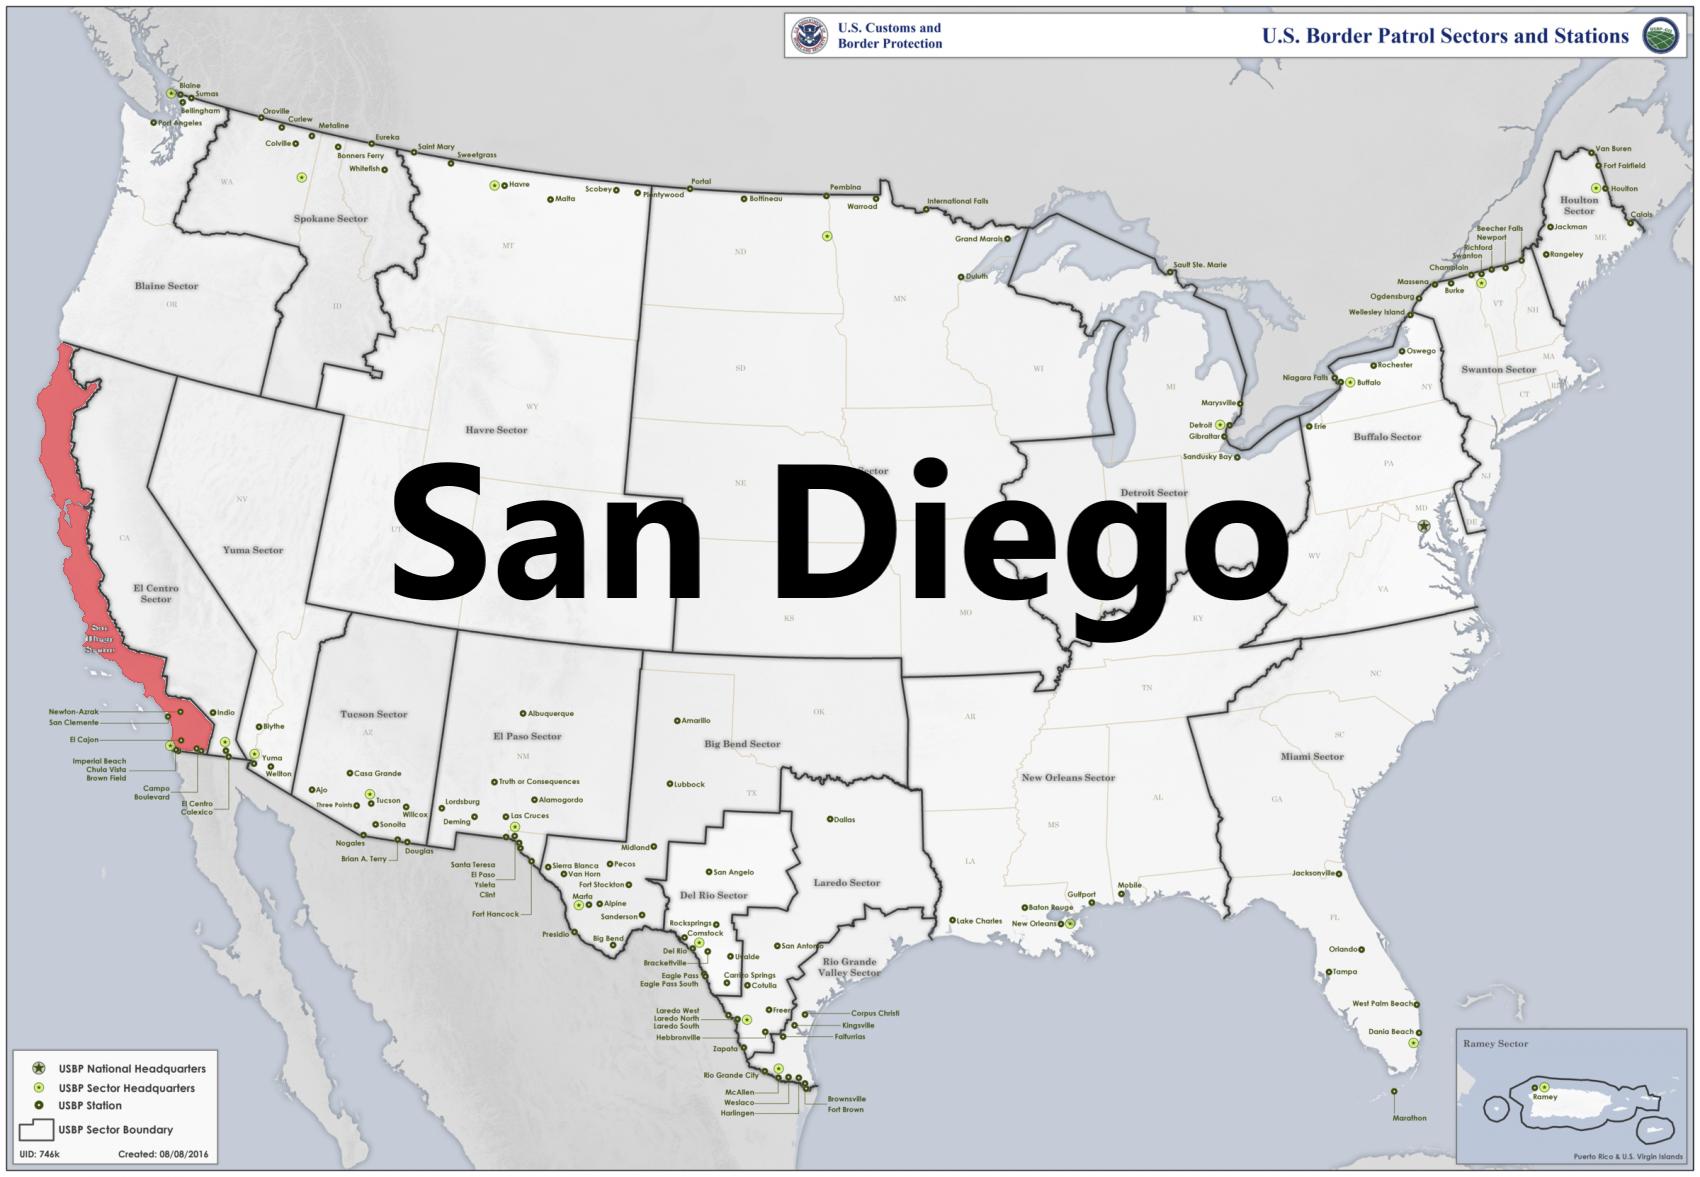 Border patrol sectors map - San Diego.png